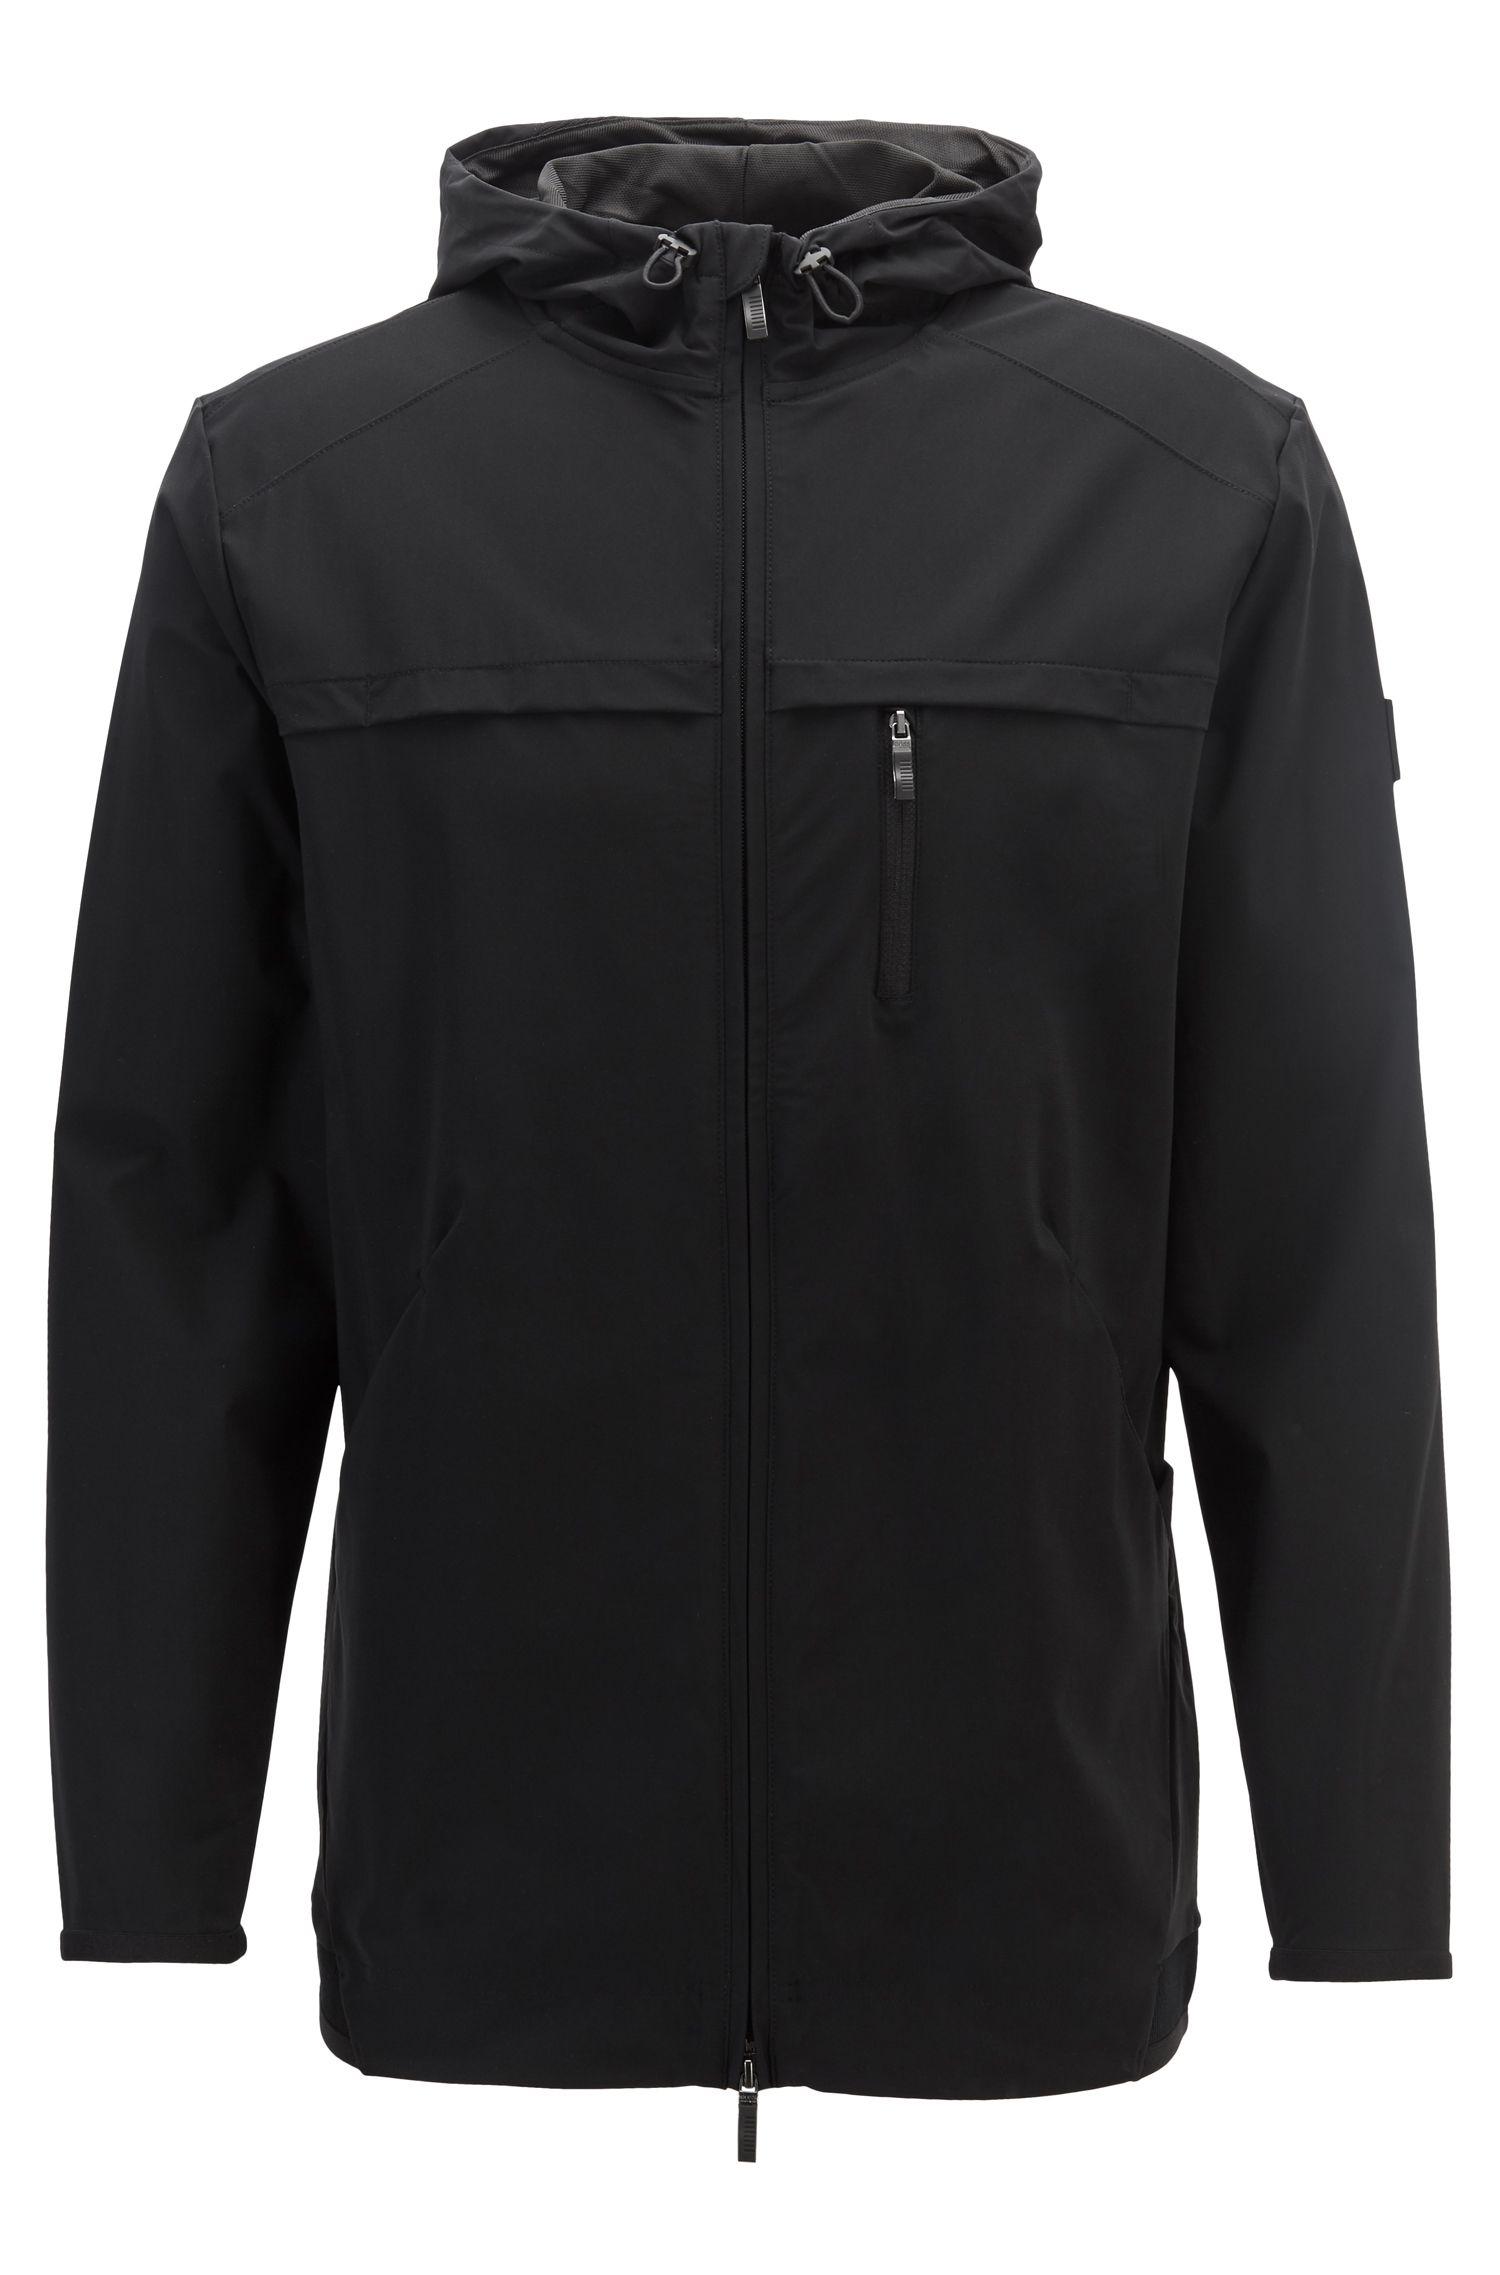 Hooded zip-through sweatshirt in two-way stretch fabric, Black